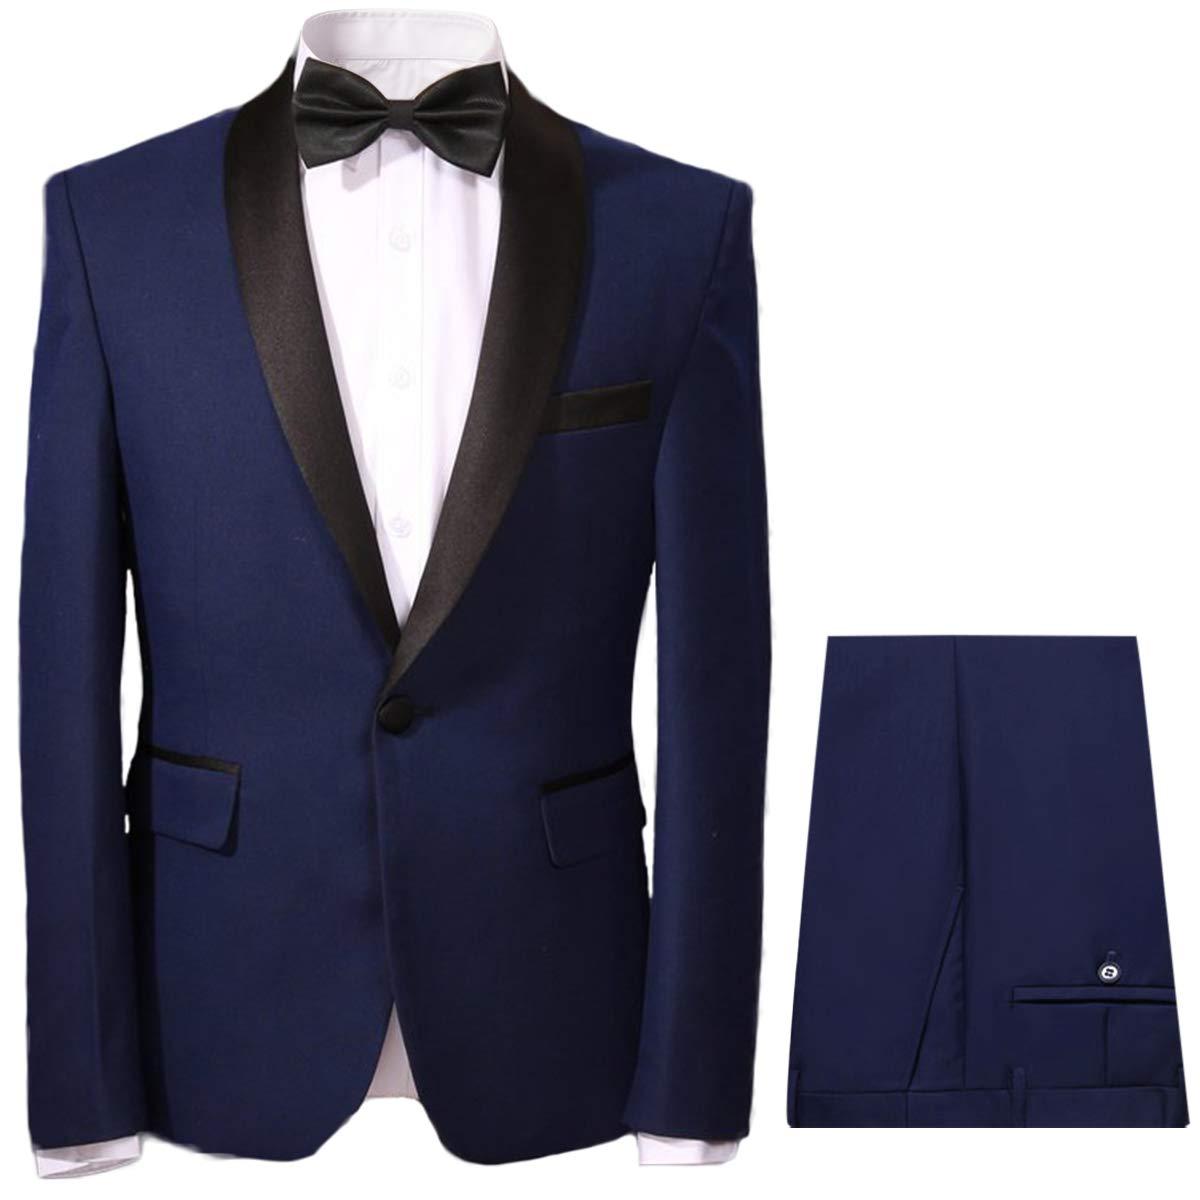 YOUTHUP Blu Cena Suit for Men Tuxedo Tux Giacca e Pantaloni Slim Fit Scialle Bavero Abito da Sera